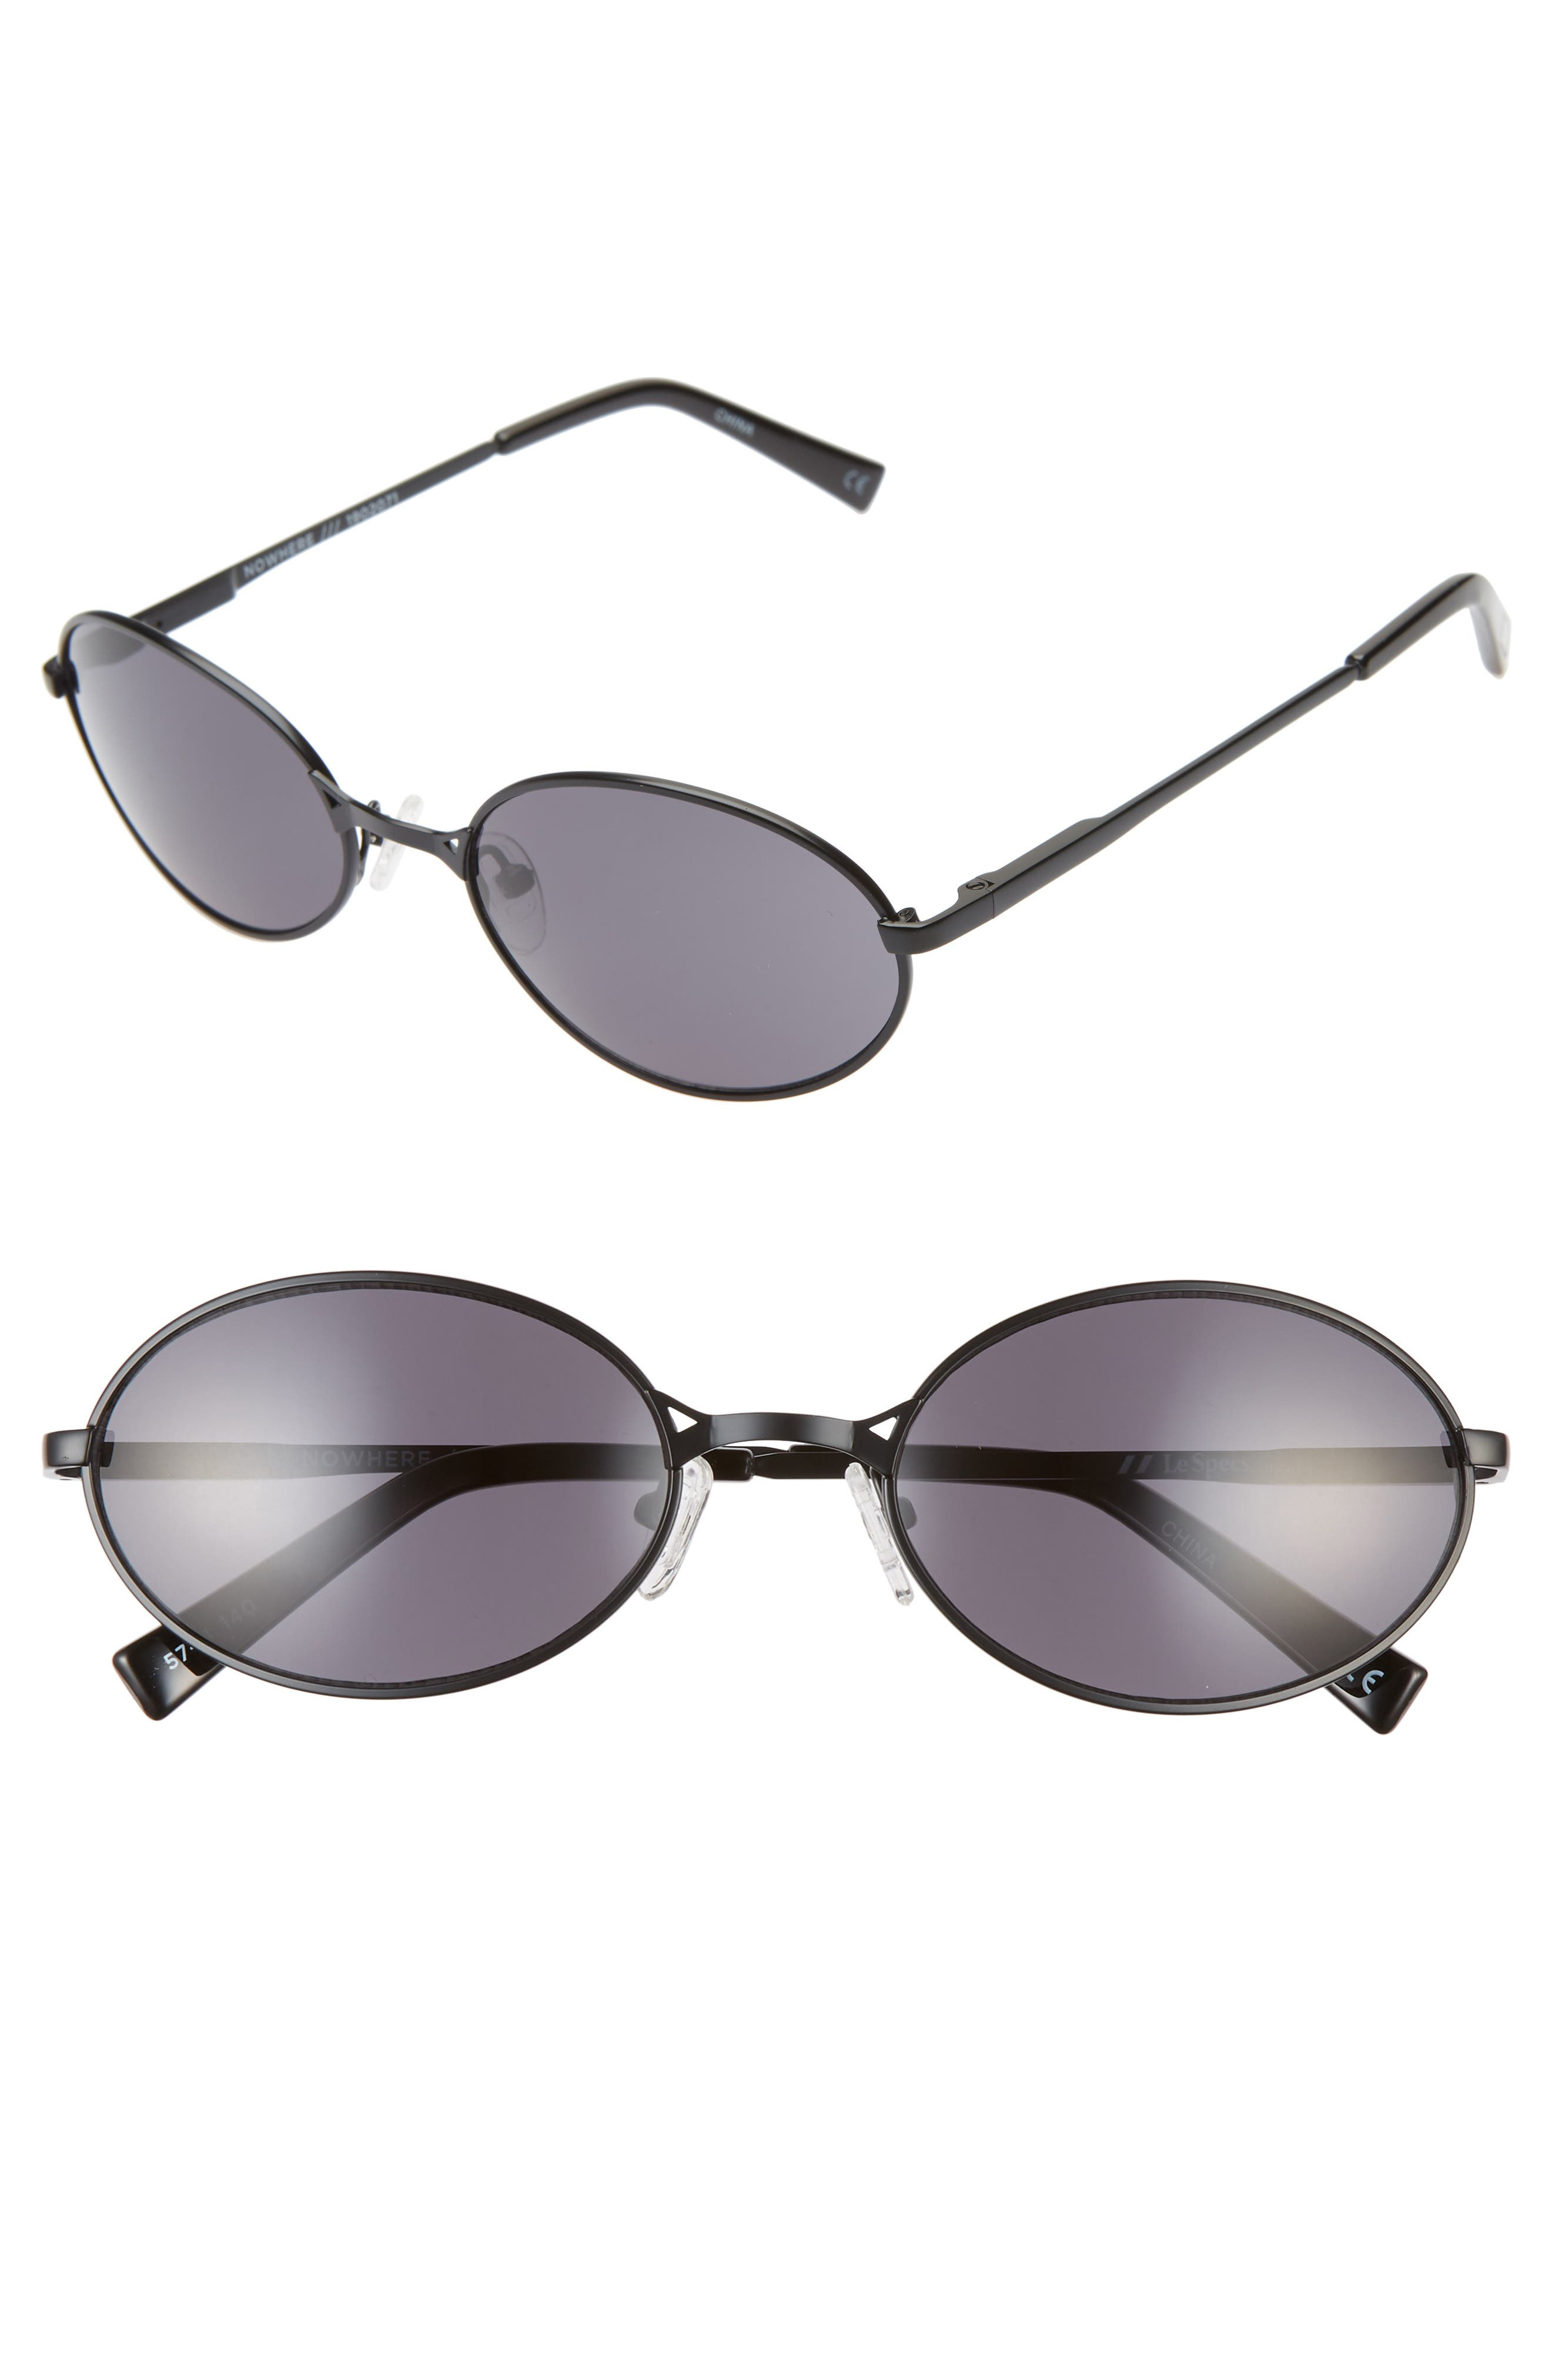 Le Specs Nowhere Rund 57Mm Oval Sunglasses - Matte Black/ Smoke